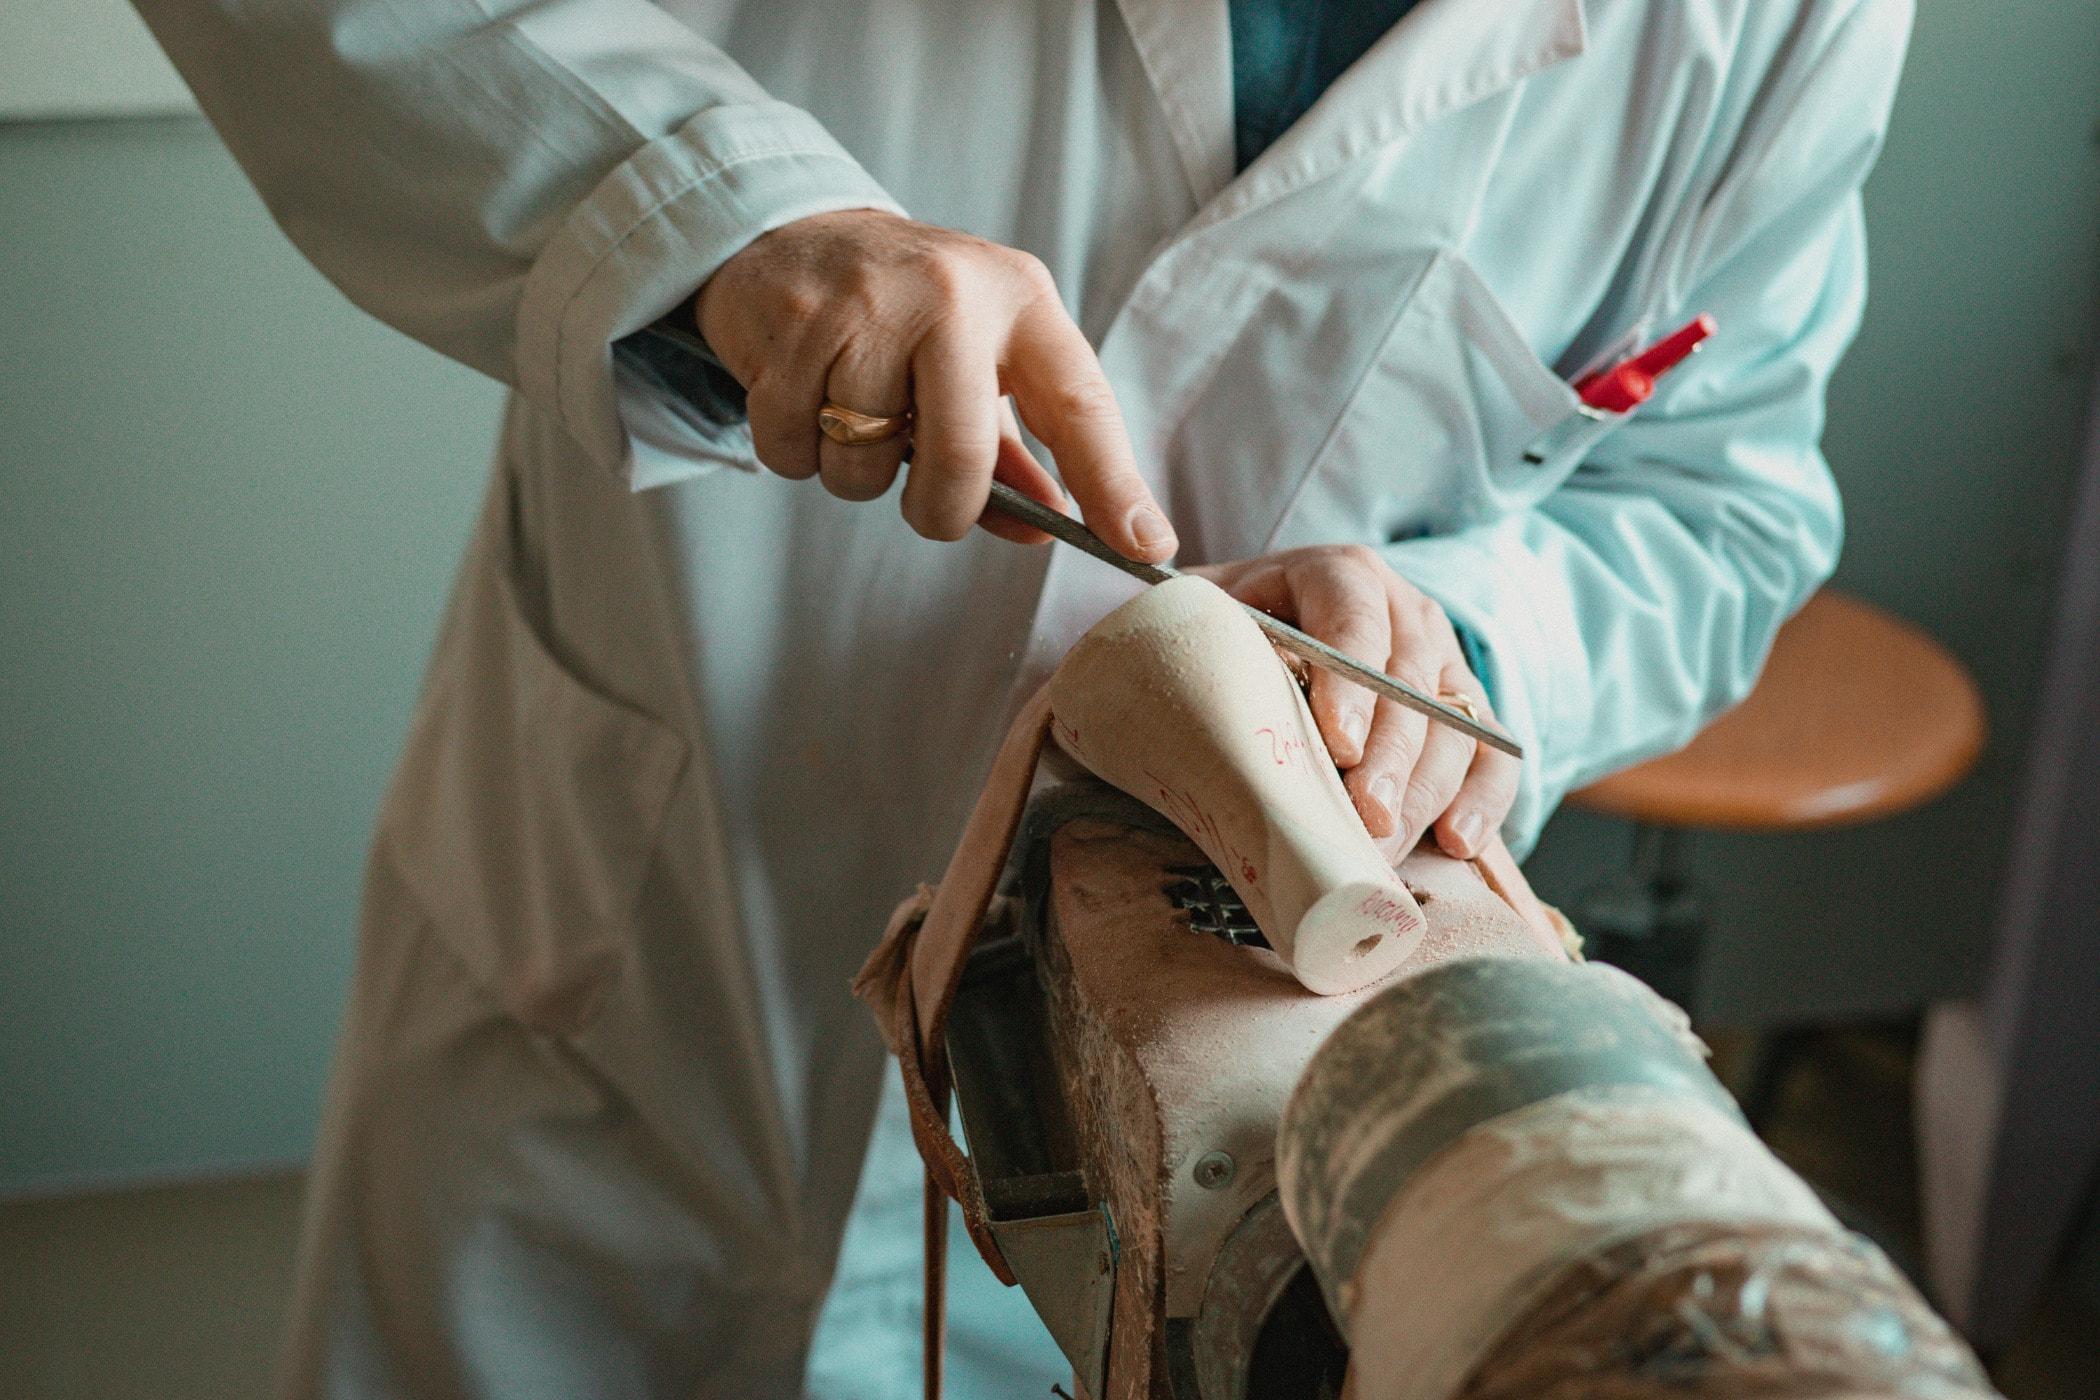 Medical procedure, Arm, Hand